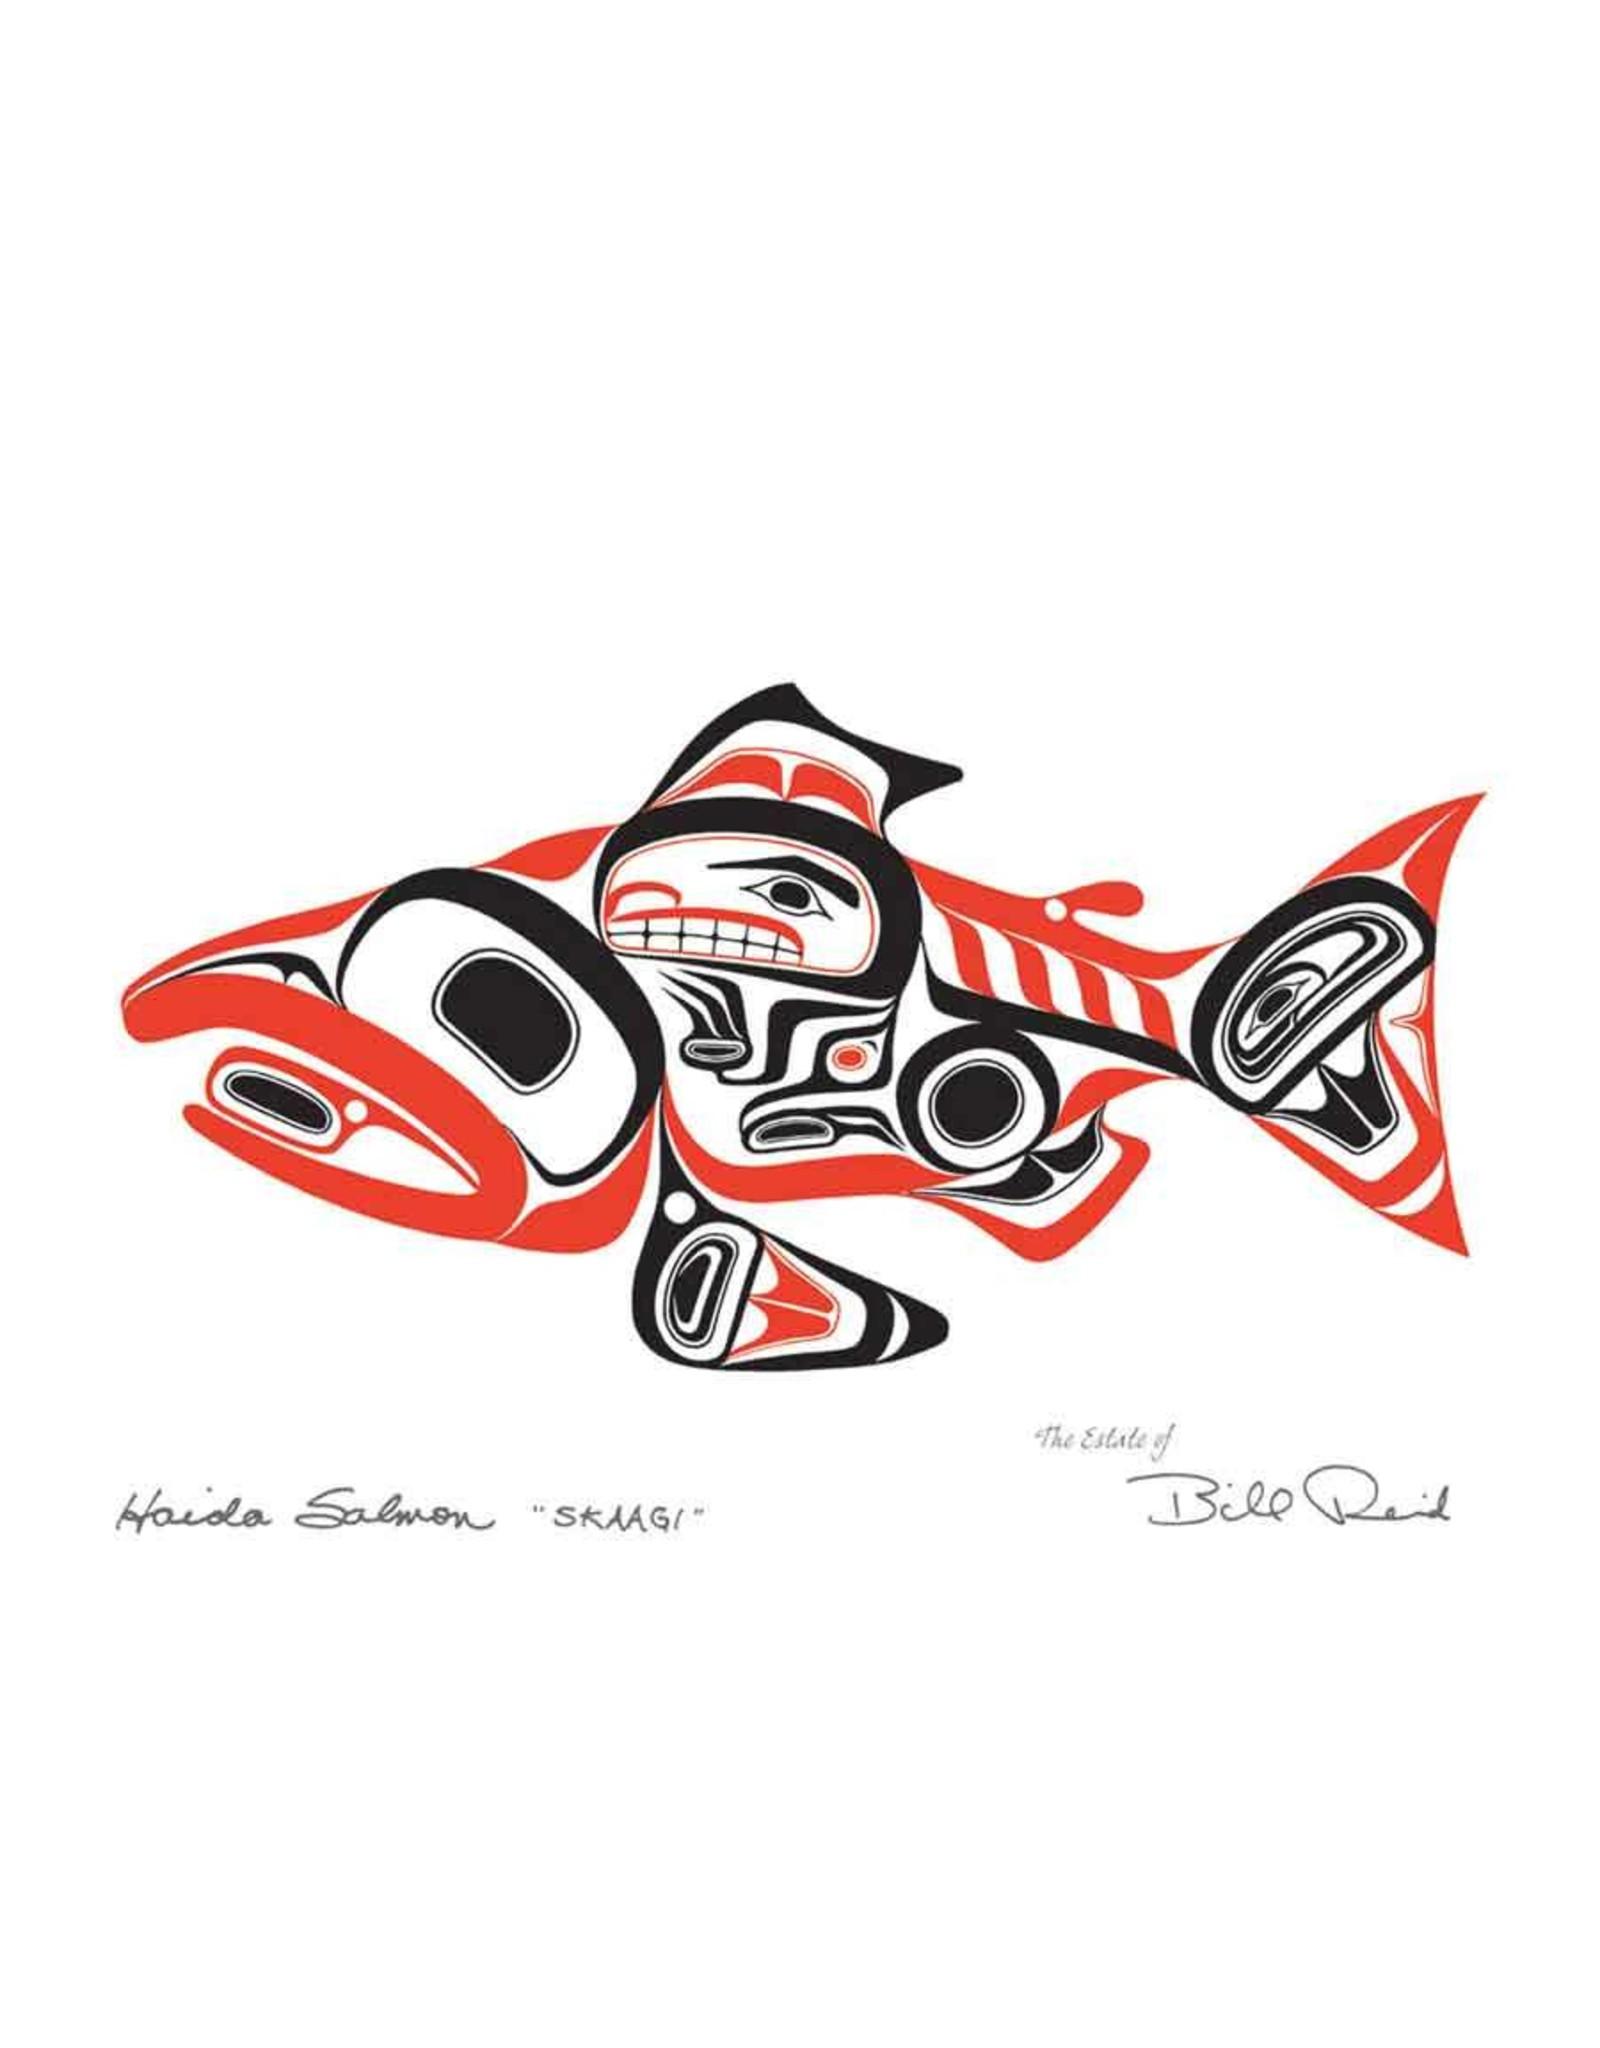 Haida Salmon - SKAAGI by Bill Reid Framed 20028